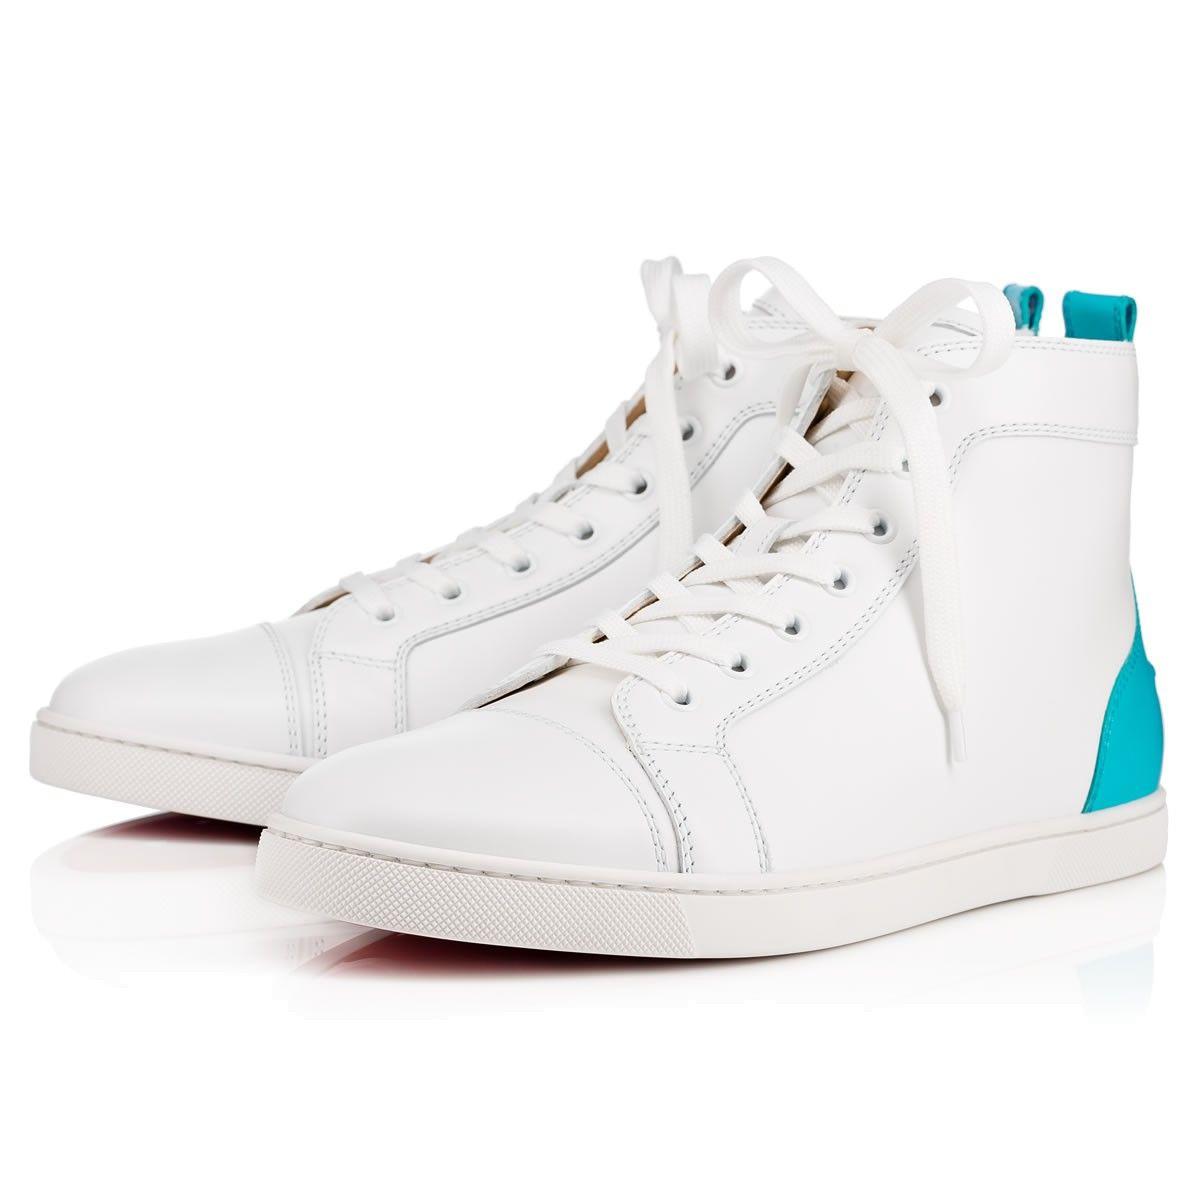 a0b484ef1c24 CHRISTIAN LOUBOUTIN SH Bip Bip Men s Flat White Leather - Men Shoes - Christian  Louboutin.  christianlouboutin  shoes